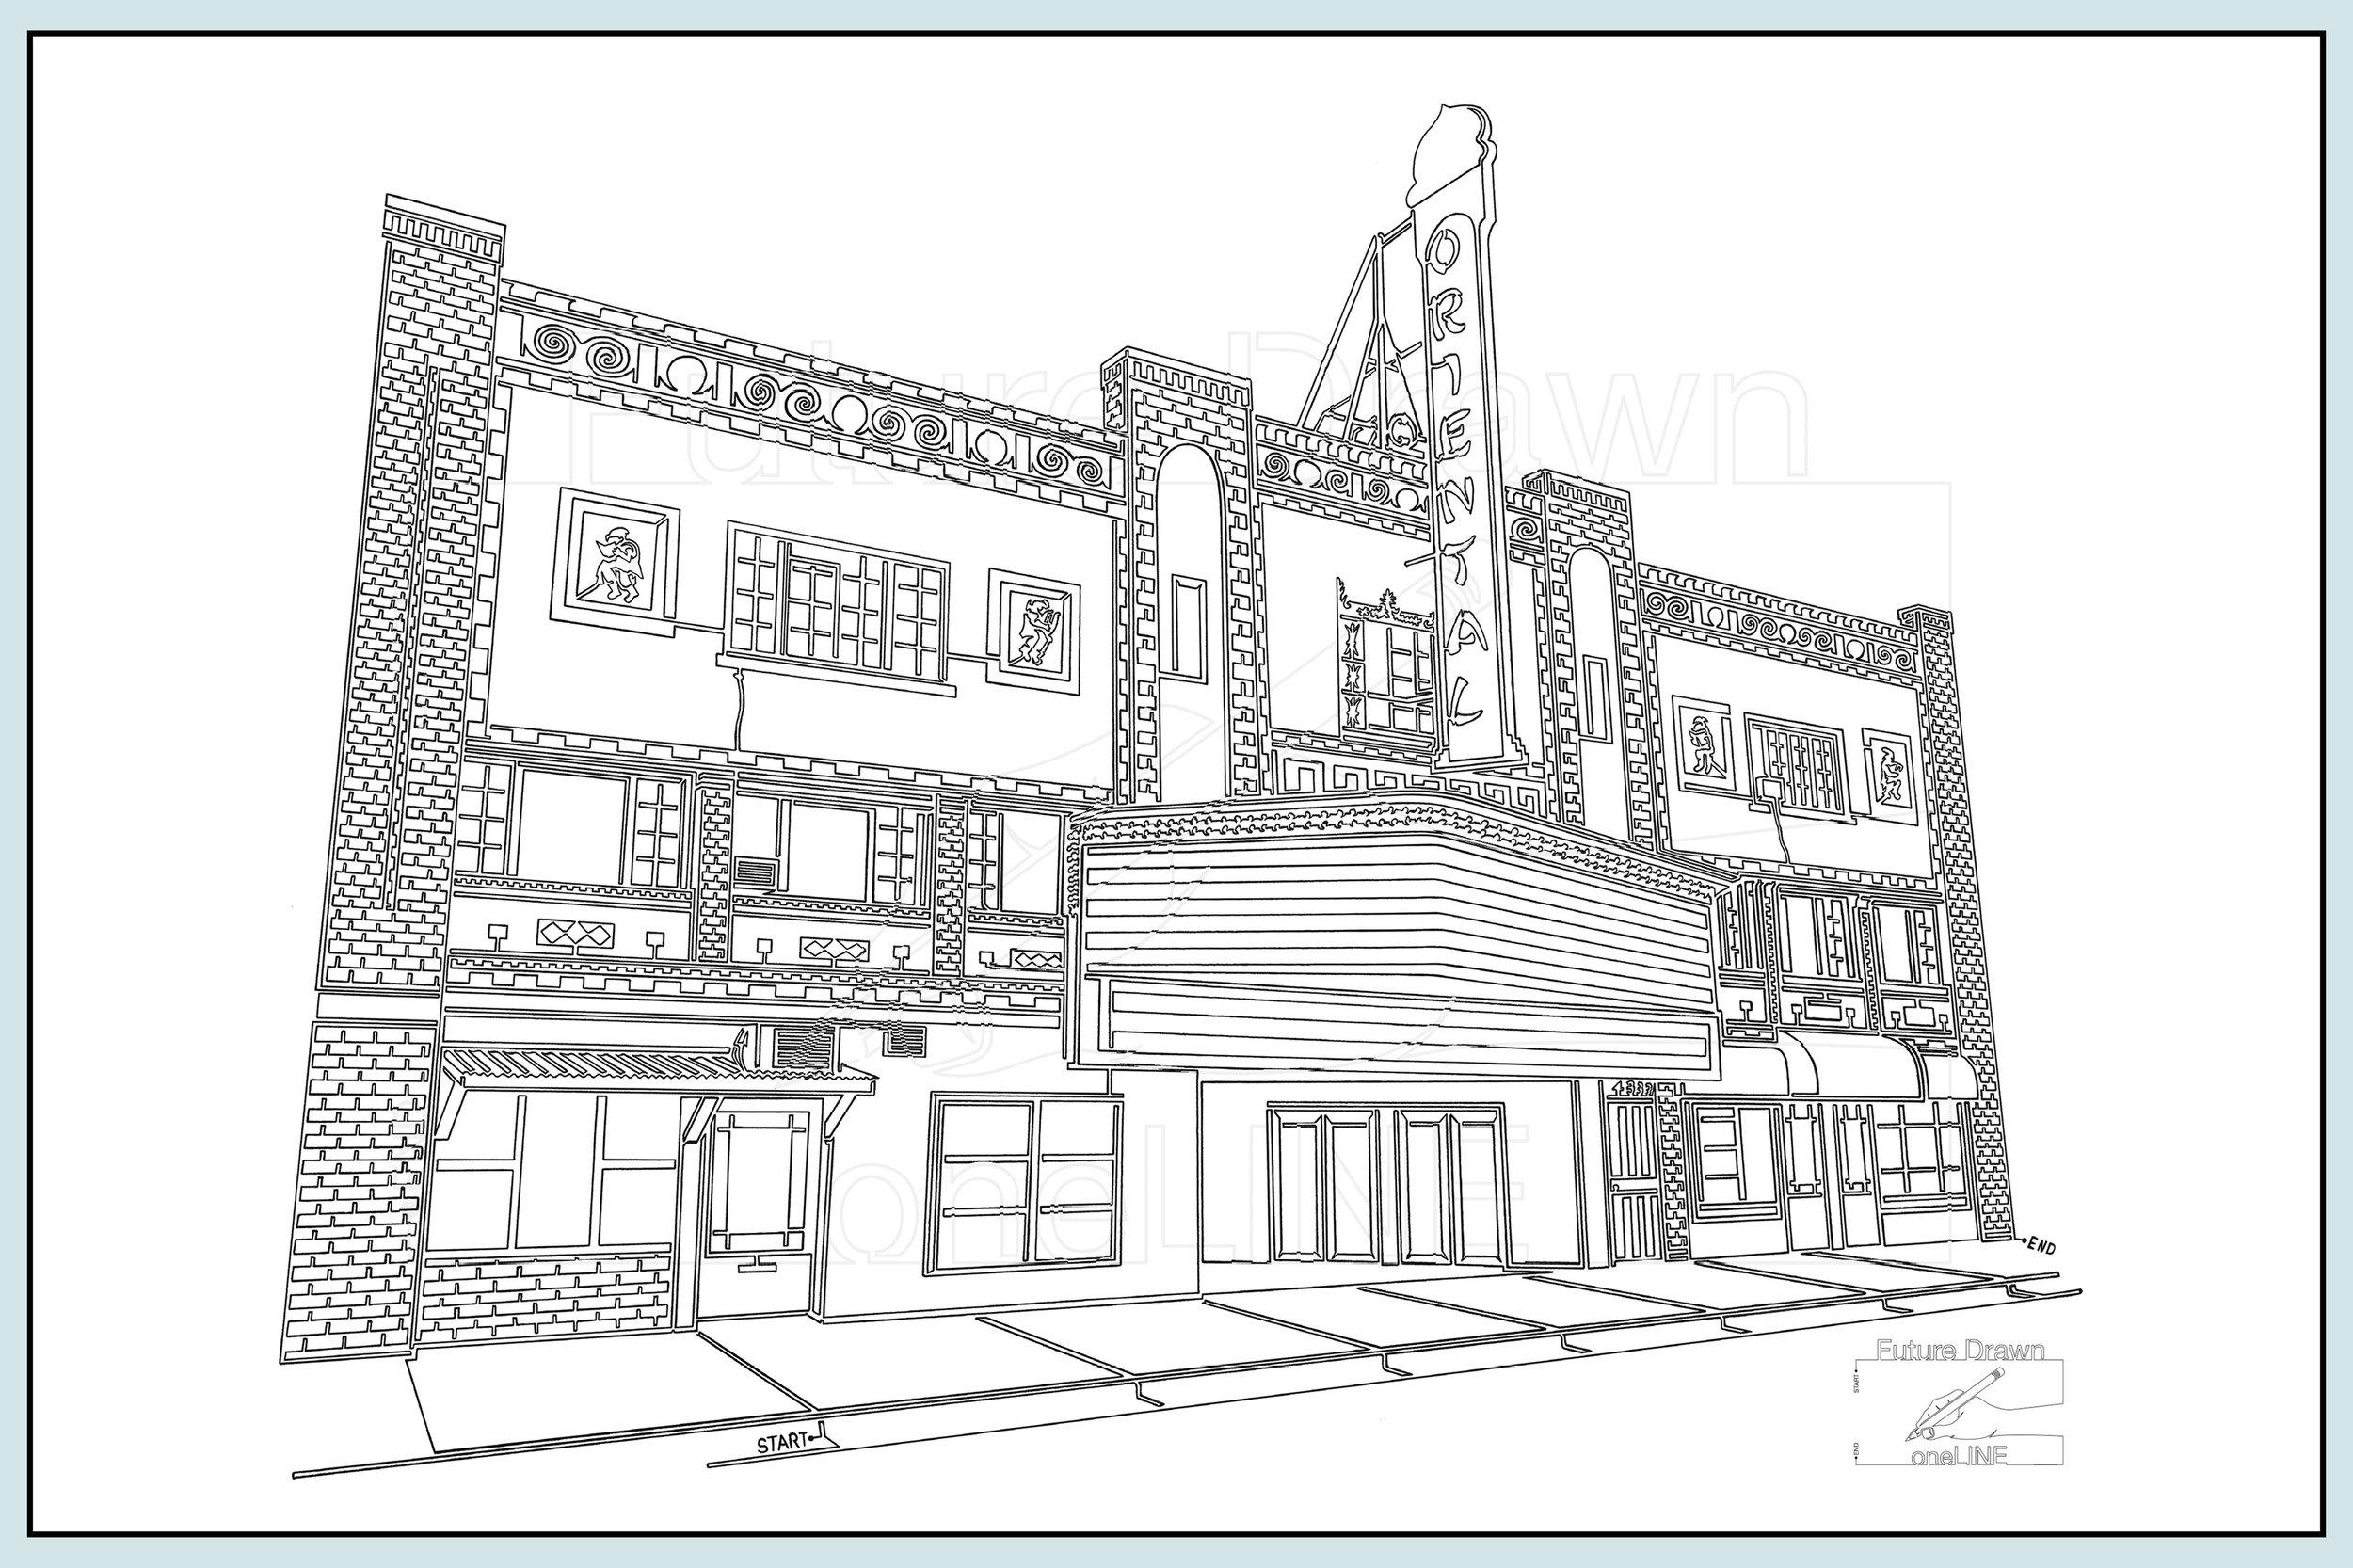 Web-Gallery Item- Oriental Theater- oneLINE Future Drawn Applegate.jpg